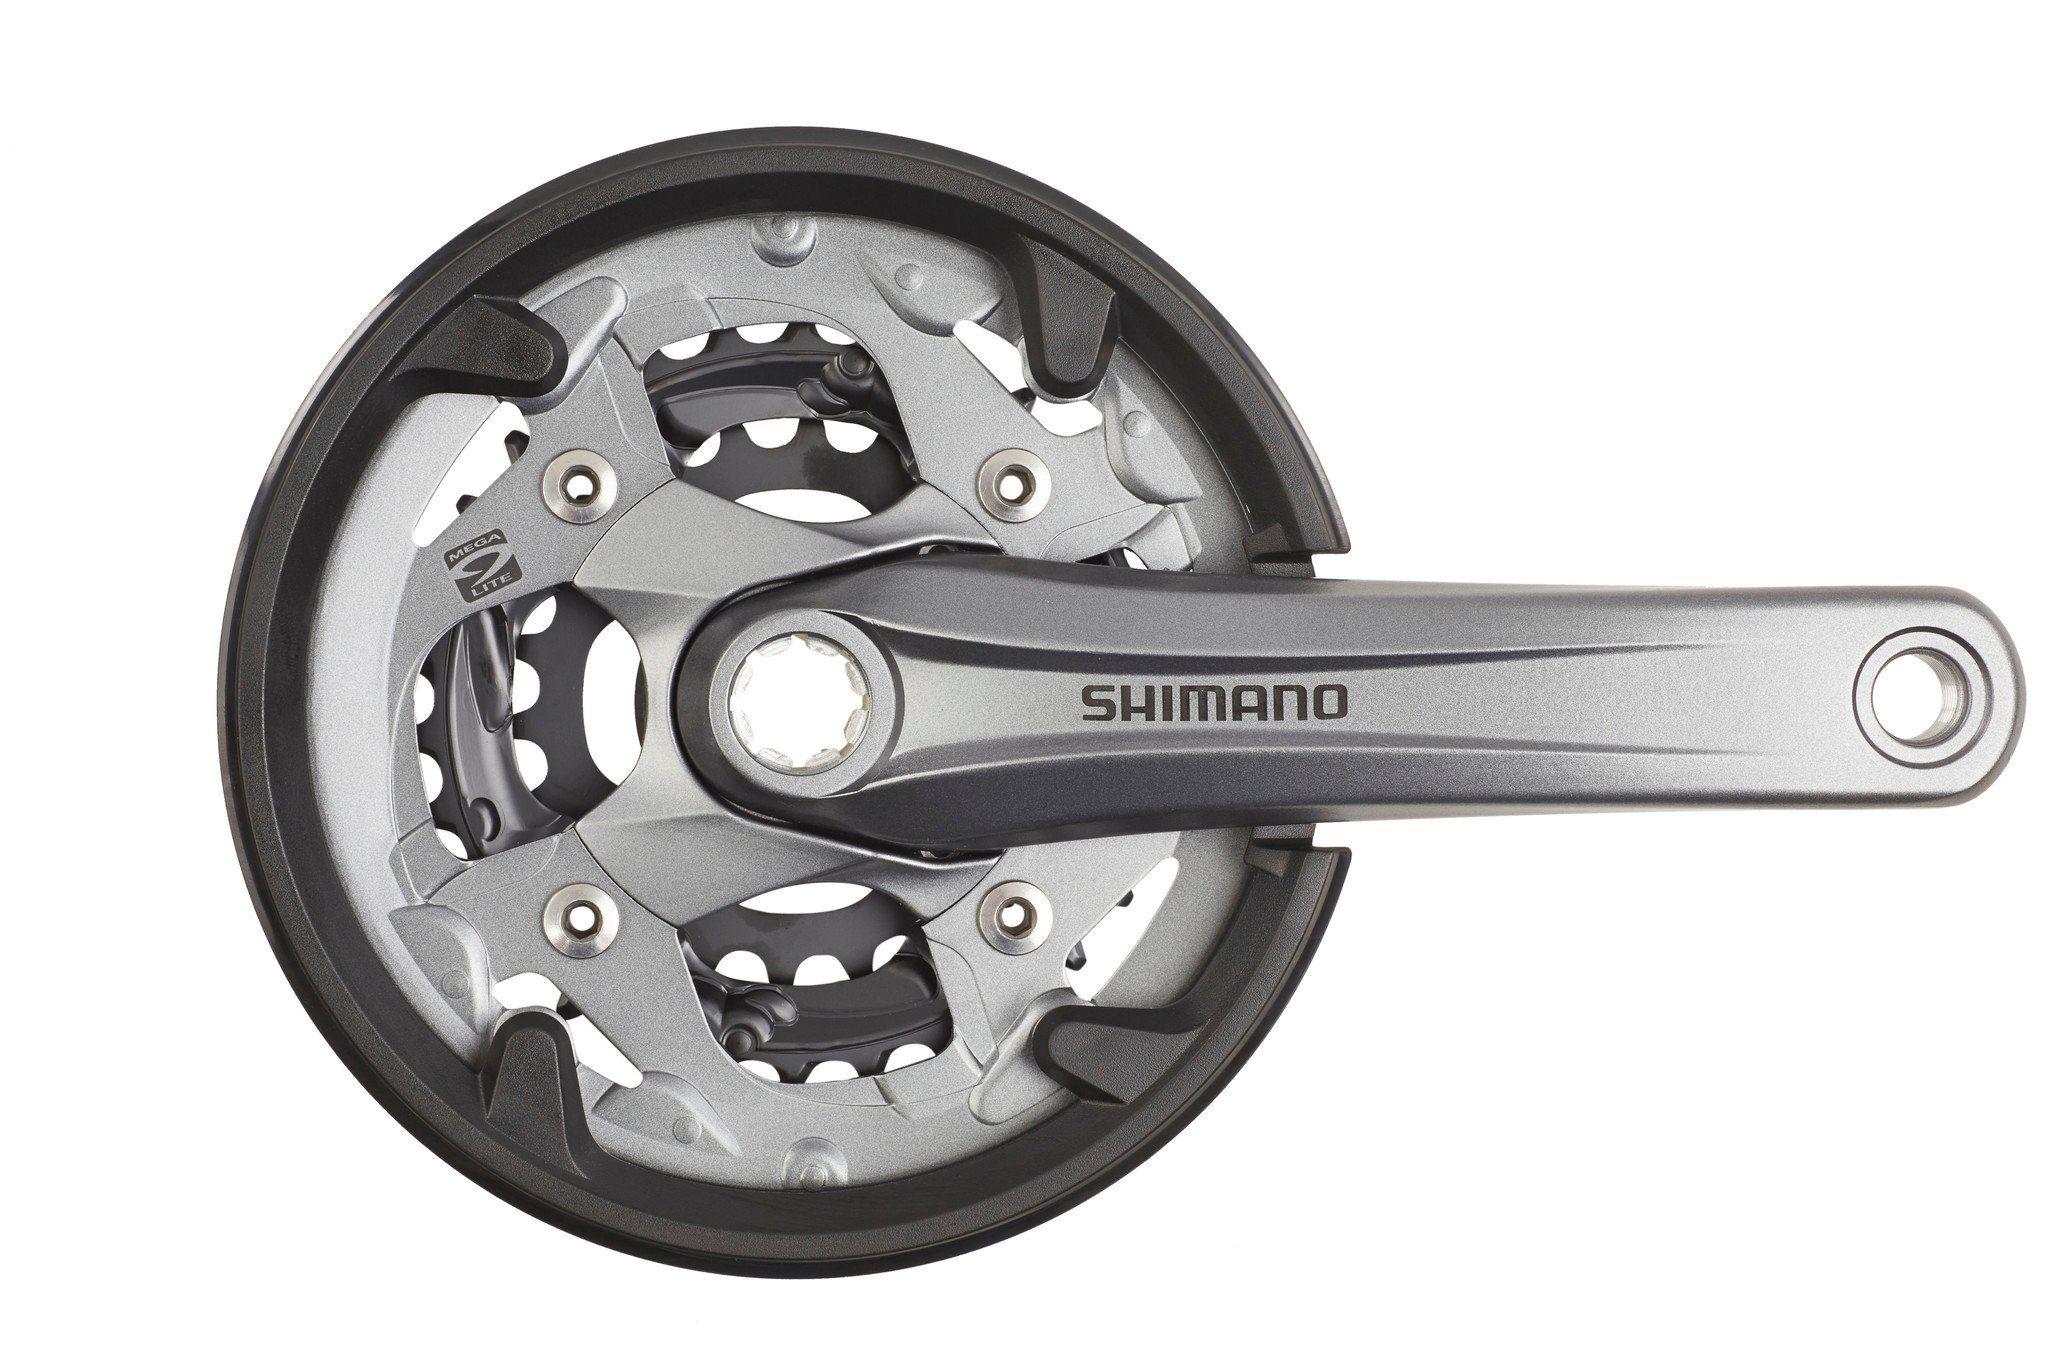 Shimano Kurbel »Alivio FC-M4000 Kurbelgarnitur 40/30/22, 9-fach«